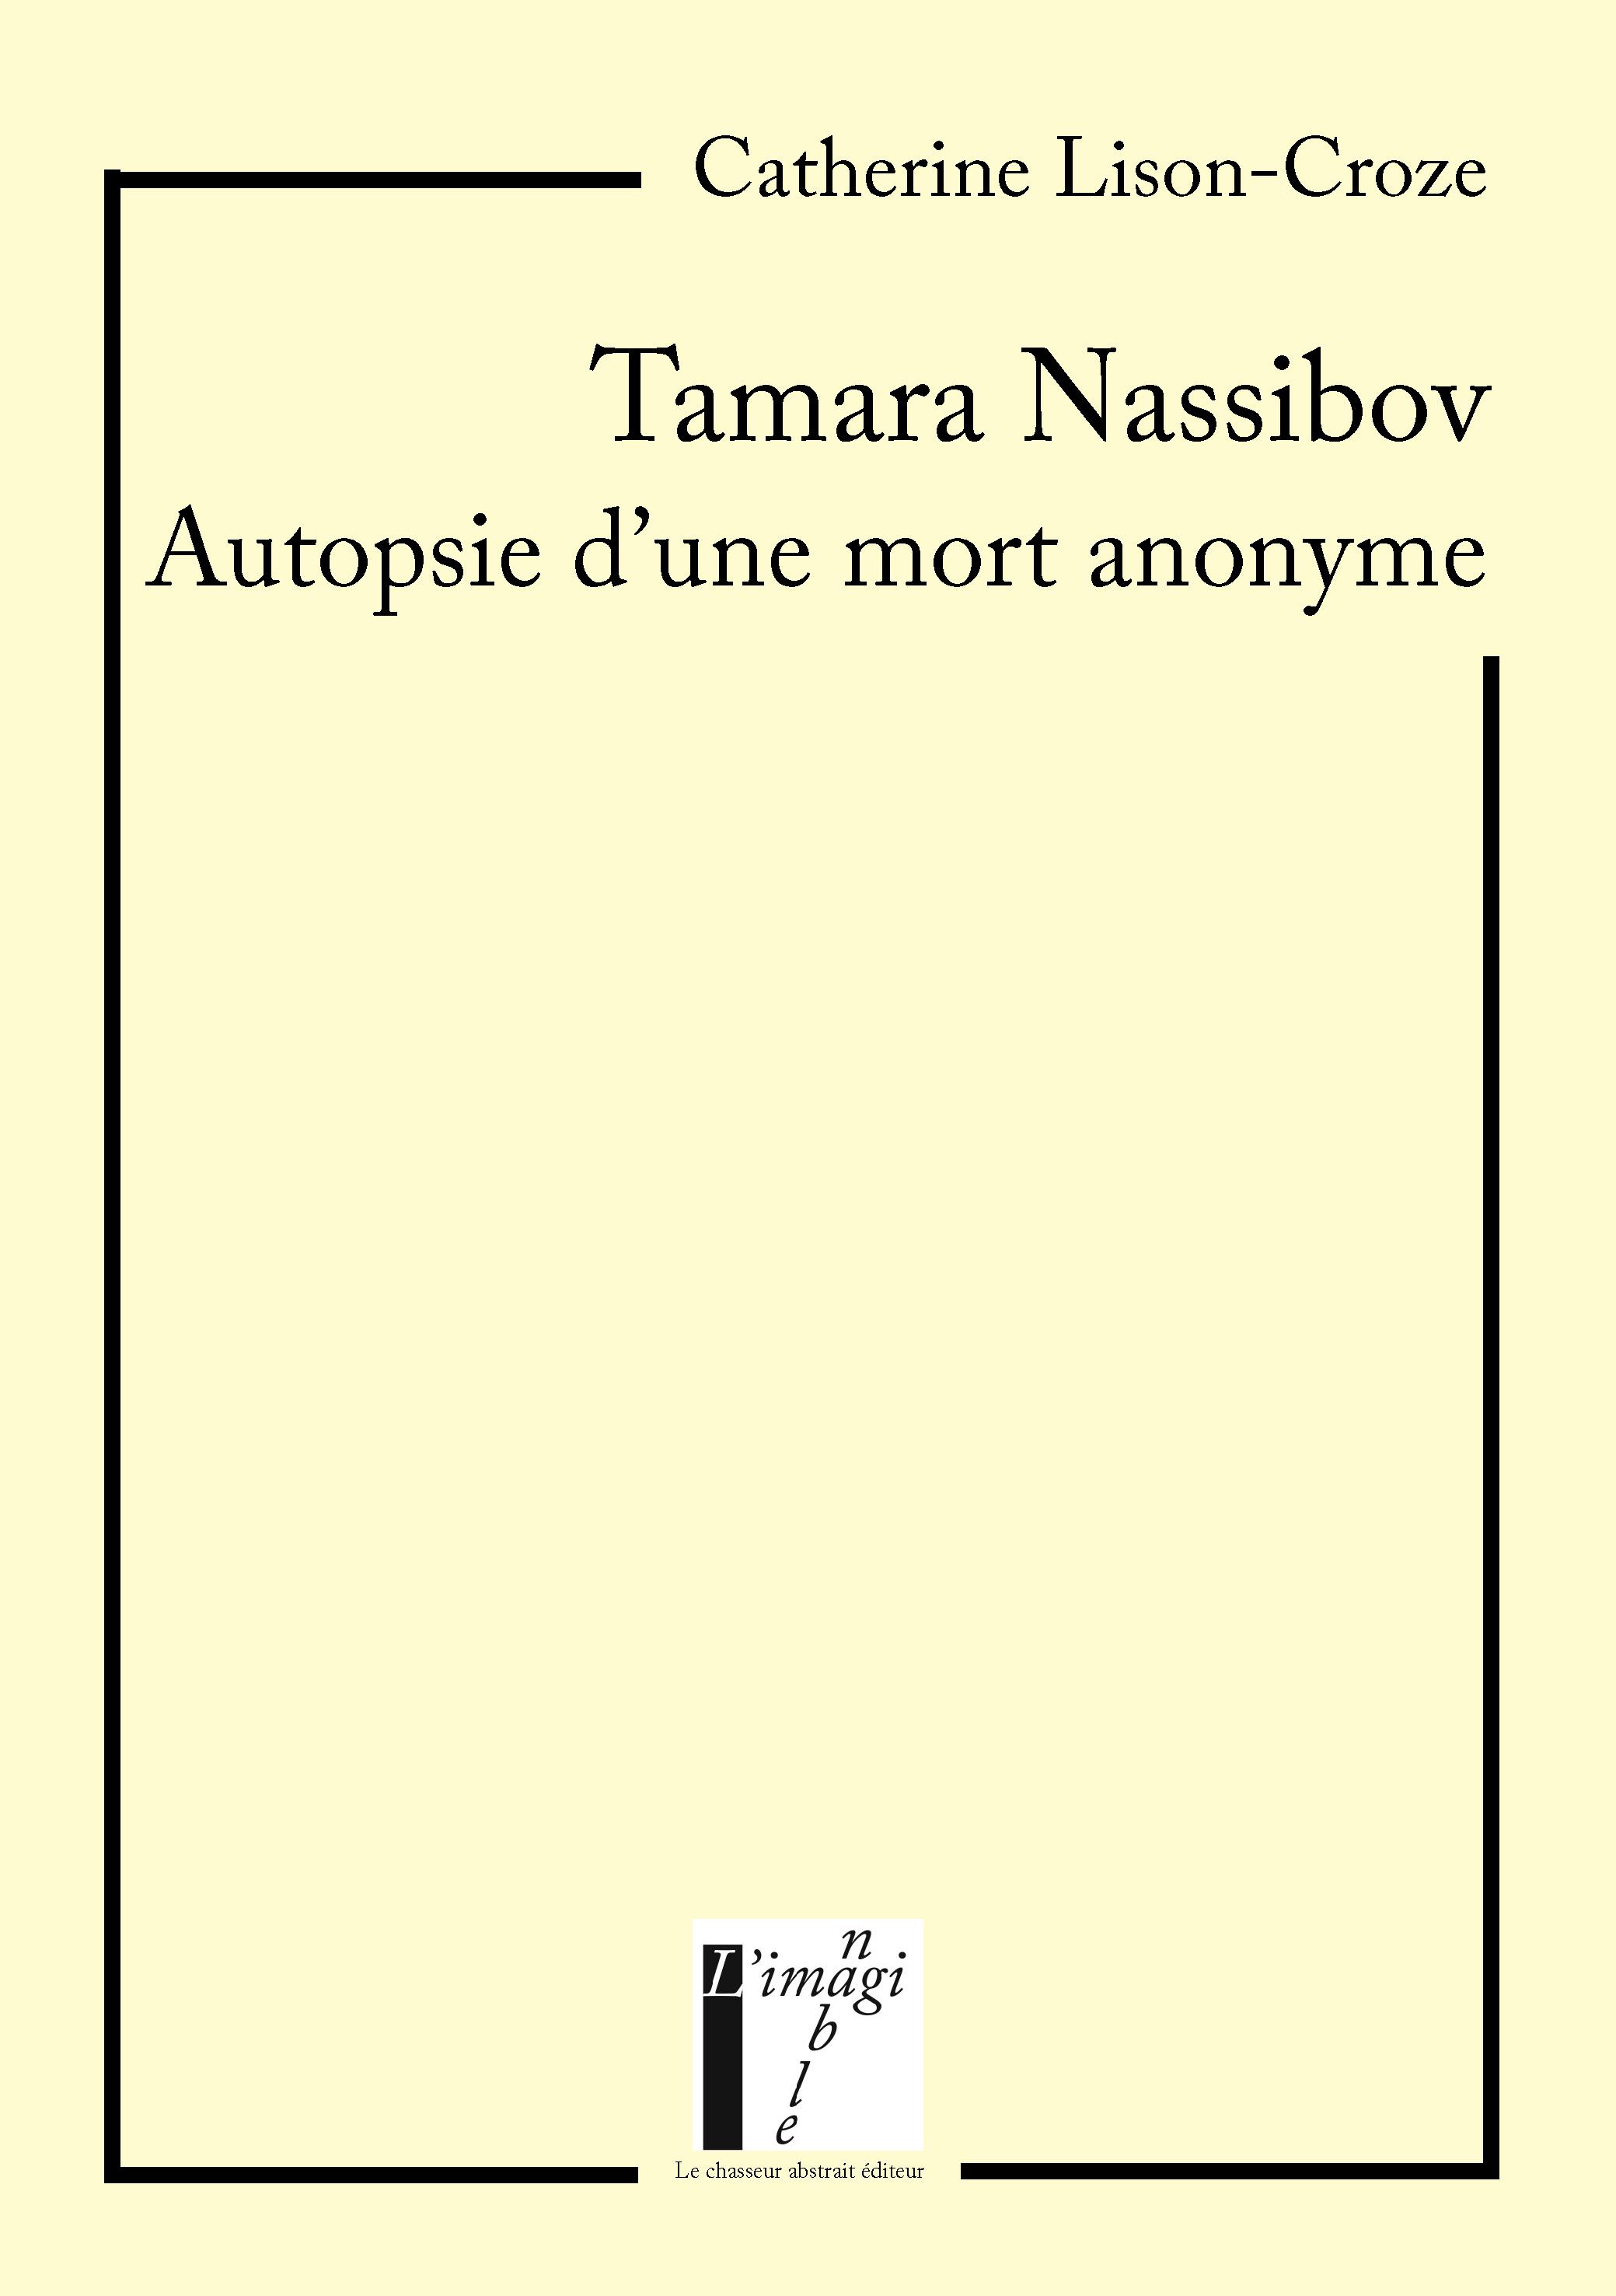 TAMARA NASSIBOV - AUTOPSIE D'UNE MORT ANONYME